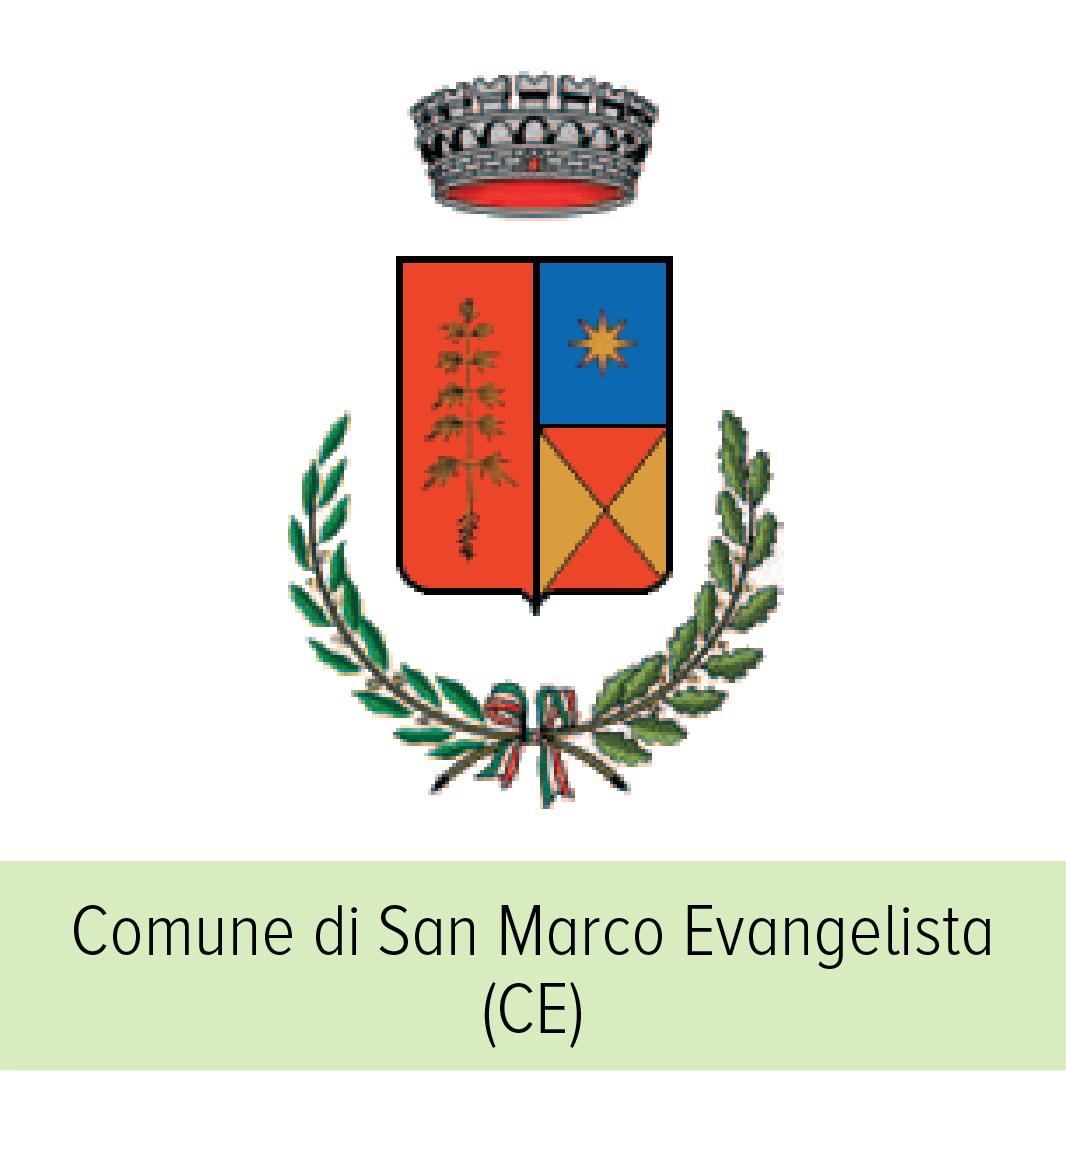 Comune di San Marco Evangelista